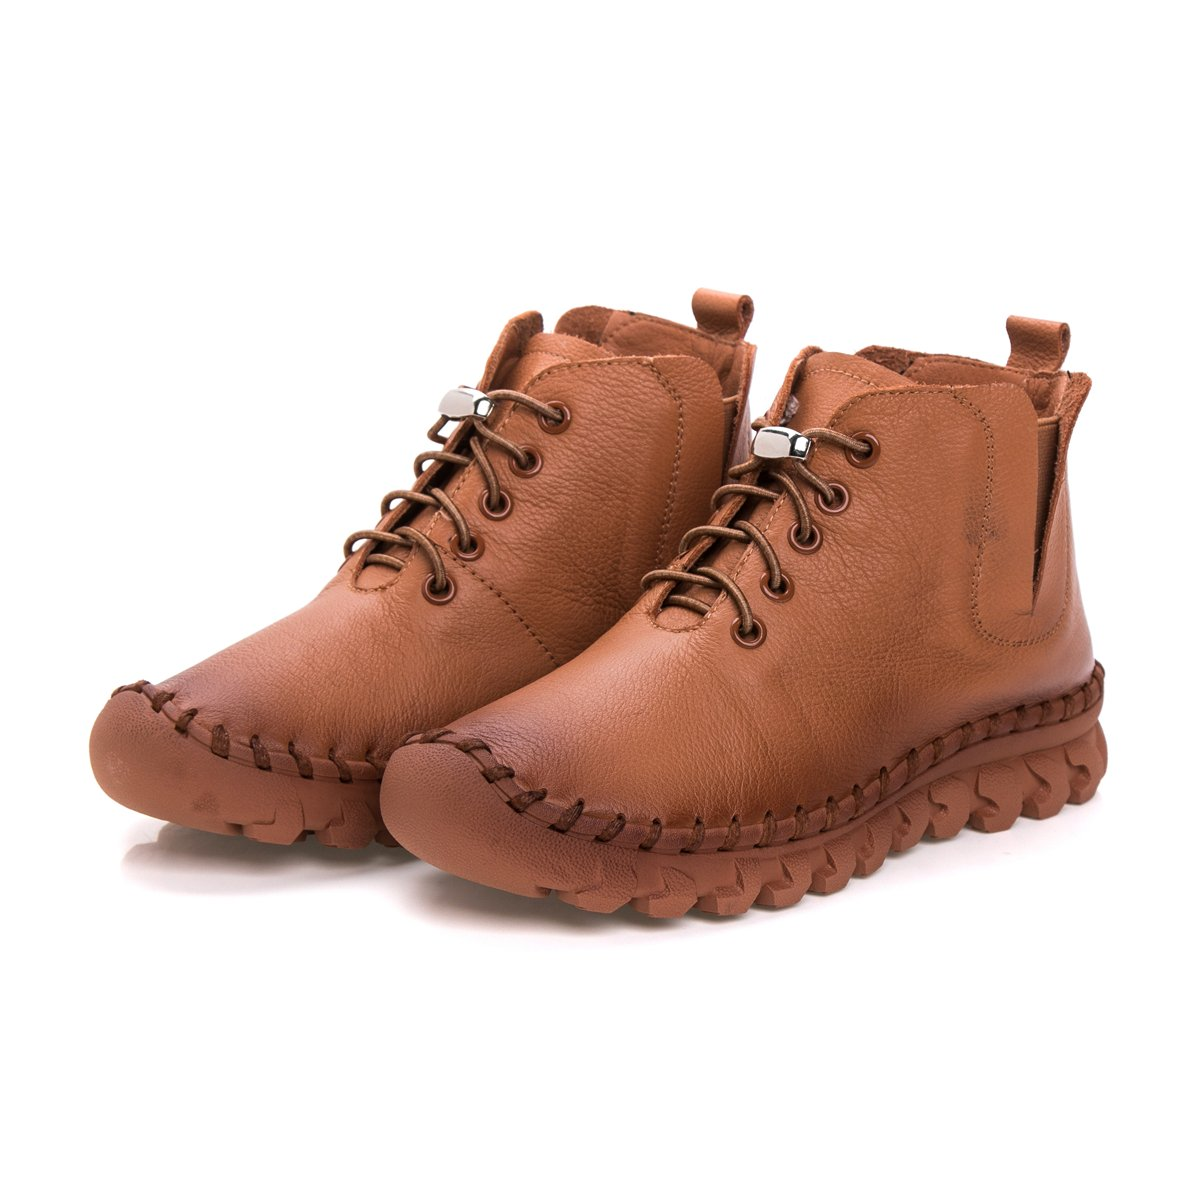 Antiordin Women's Calf Leather Booties Flat Ankle Boots US|Velvet Shoes B0756CYCGX 8.5 B(M) US|Velvet Boots Black 99c73a